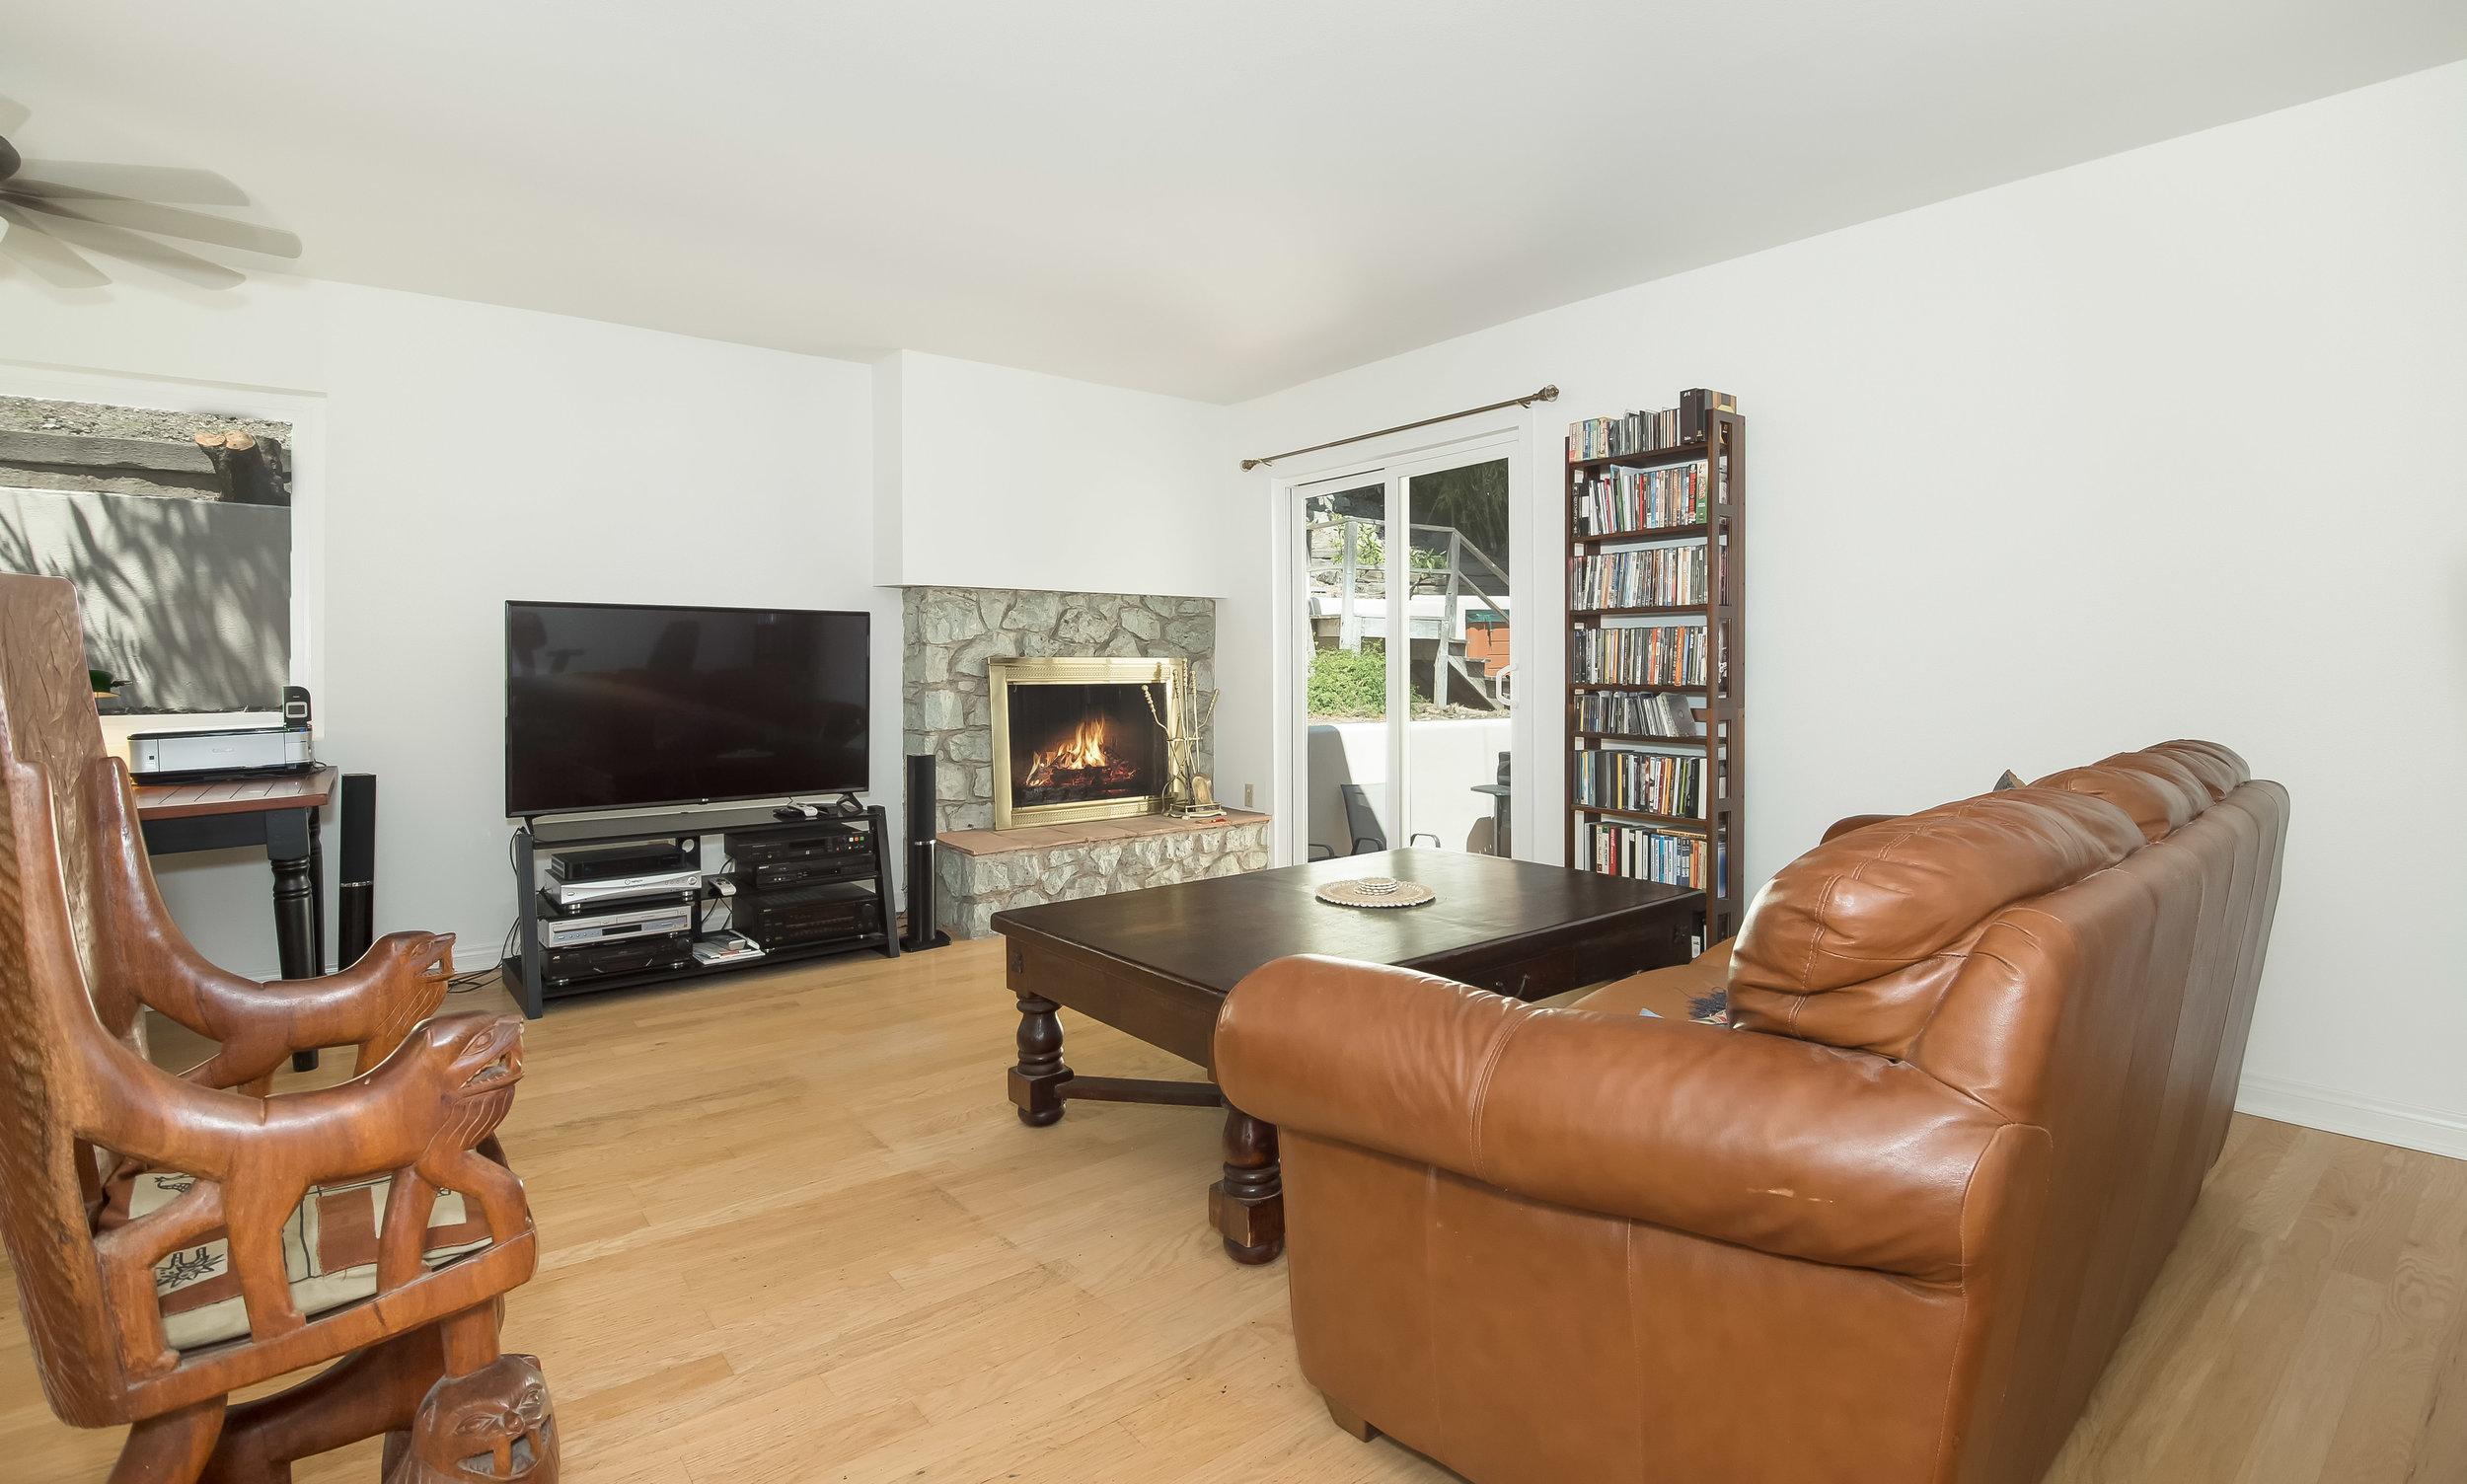 005 Living Room 15072 Rayneta Sherman Oaks For Sale The Malibu Life Team Luxury Real Estate.jpg